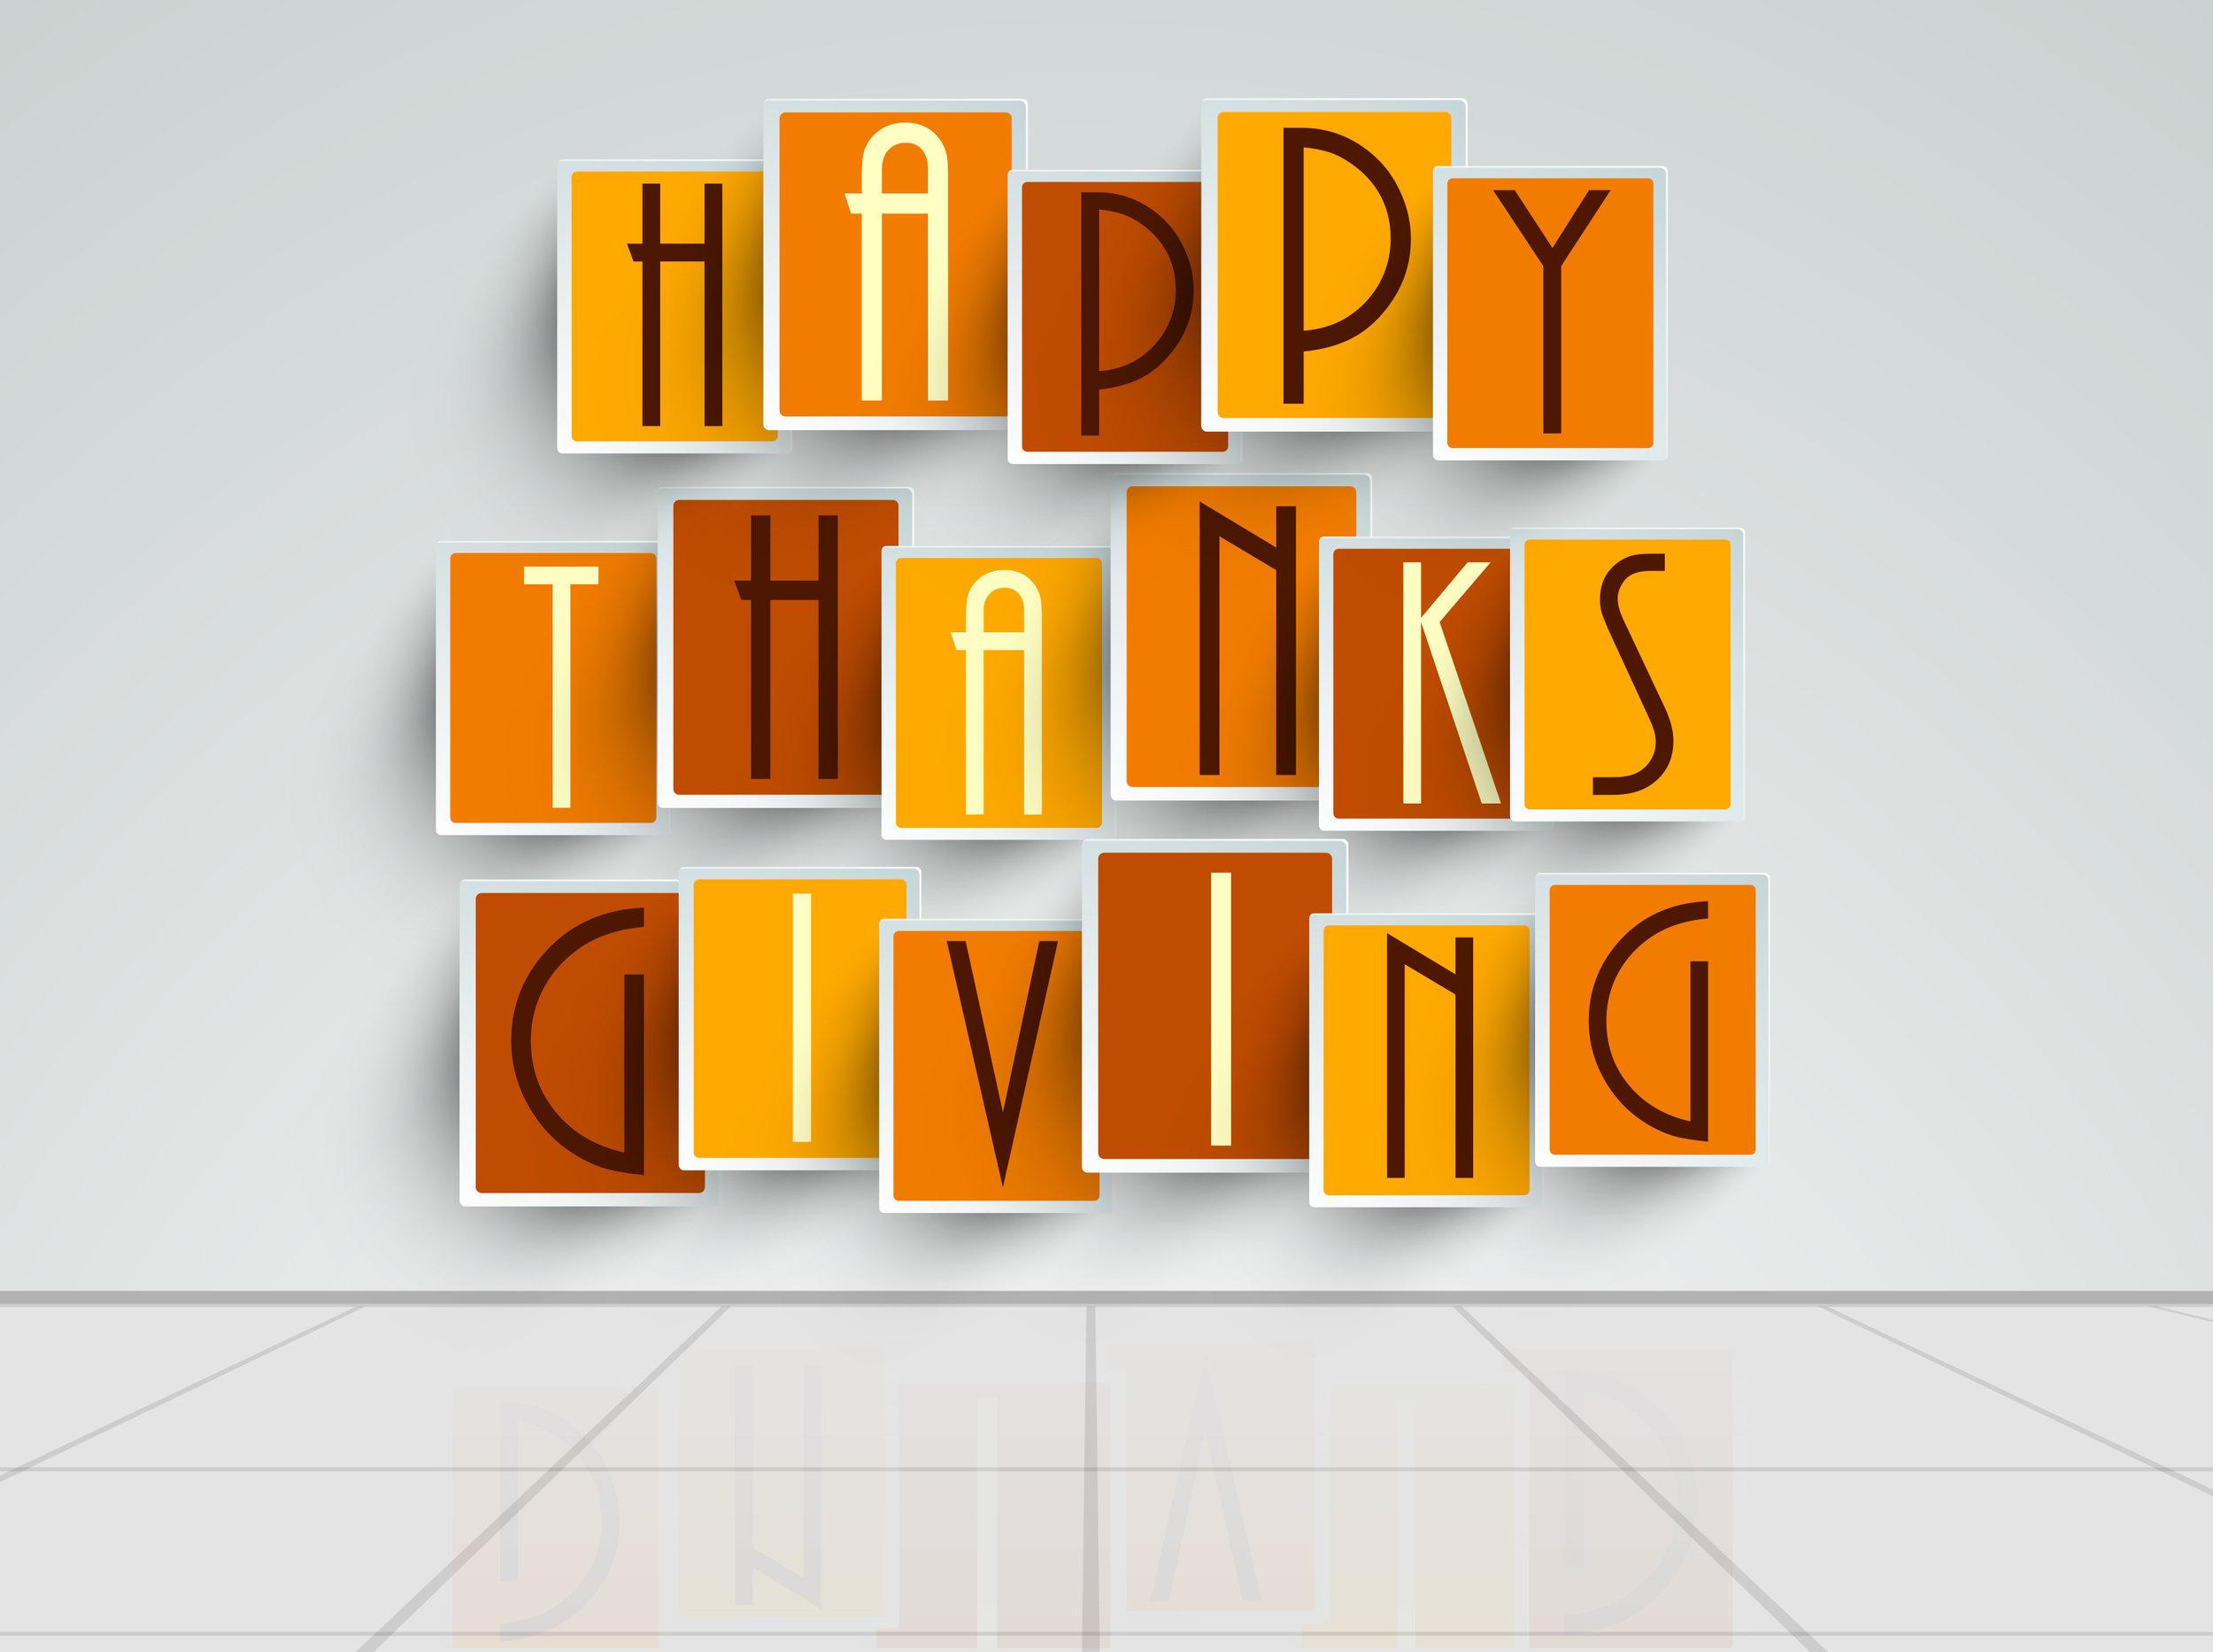 happy-thanksgiving-day-sticker_fJtCbuRu_L.jpg